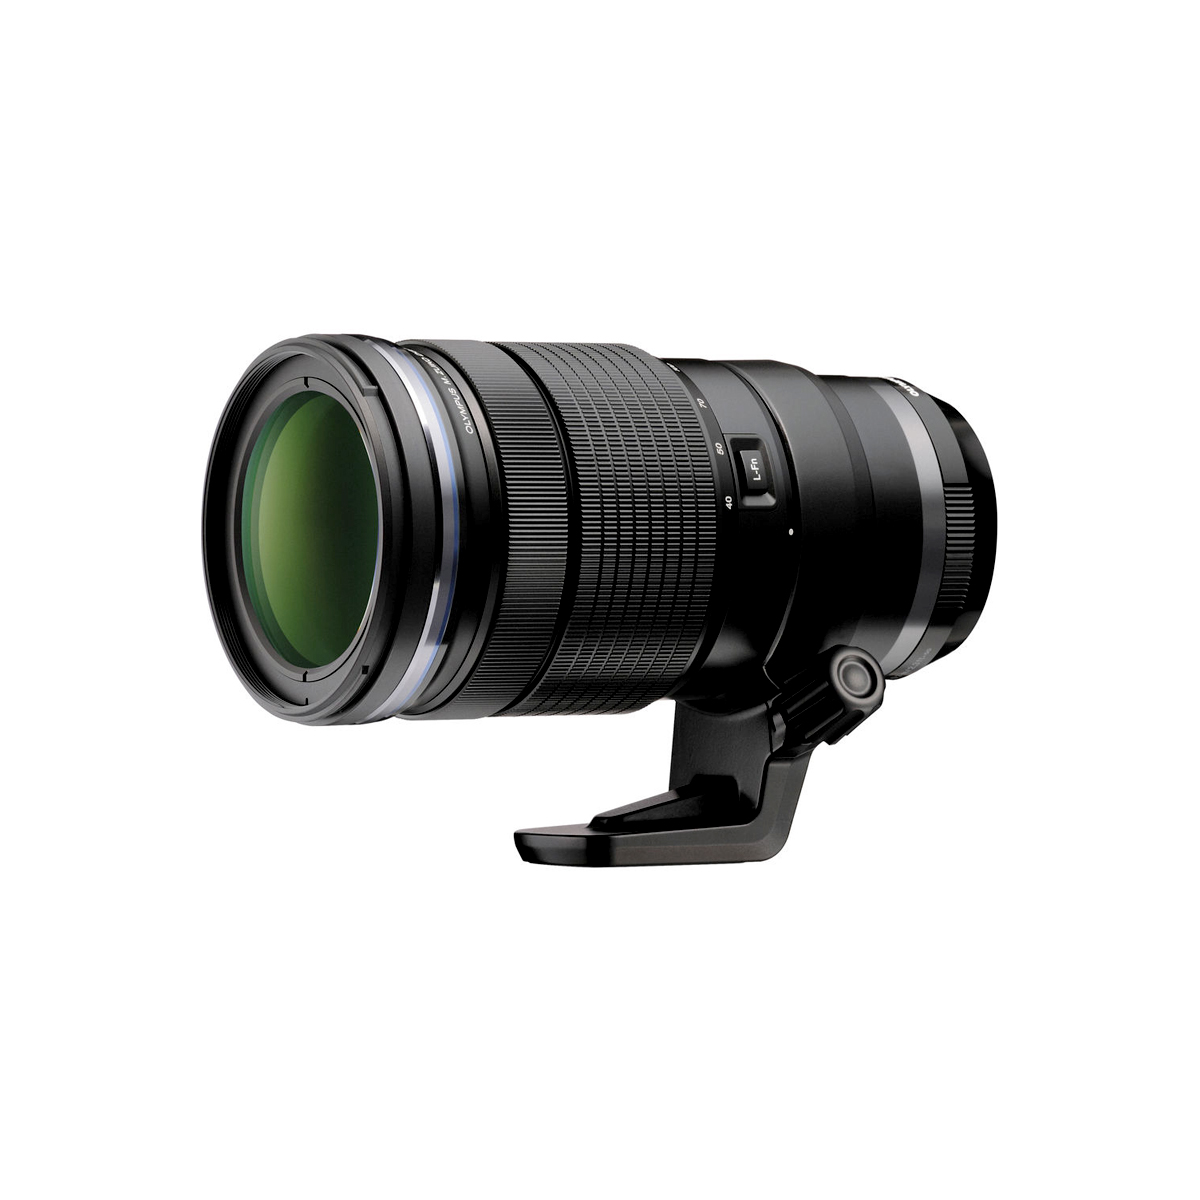 Olympus Mzuiko Digital Ed 40 150mm F 28 Pro Lens The Camera Exchange 300mm 4 Is